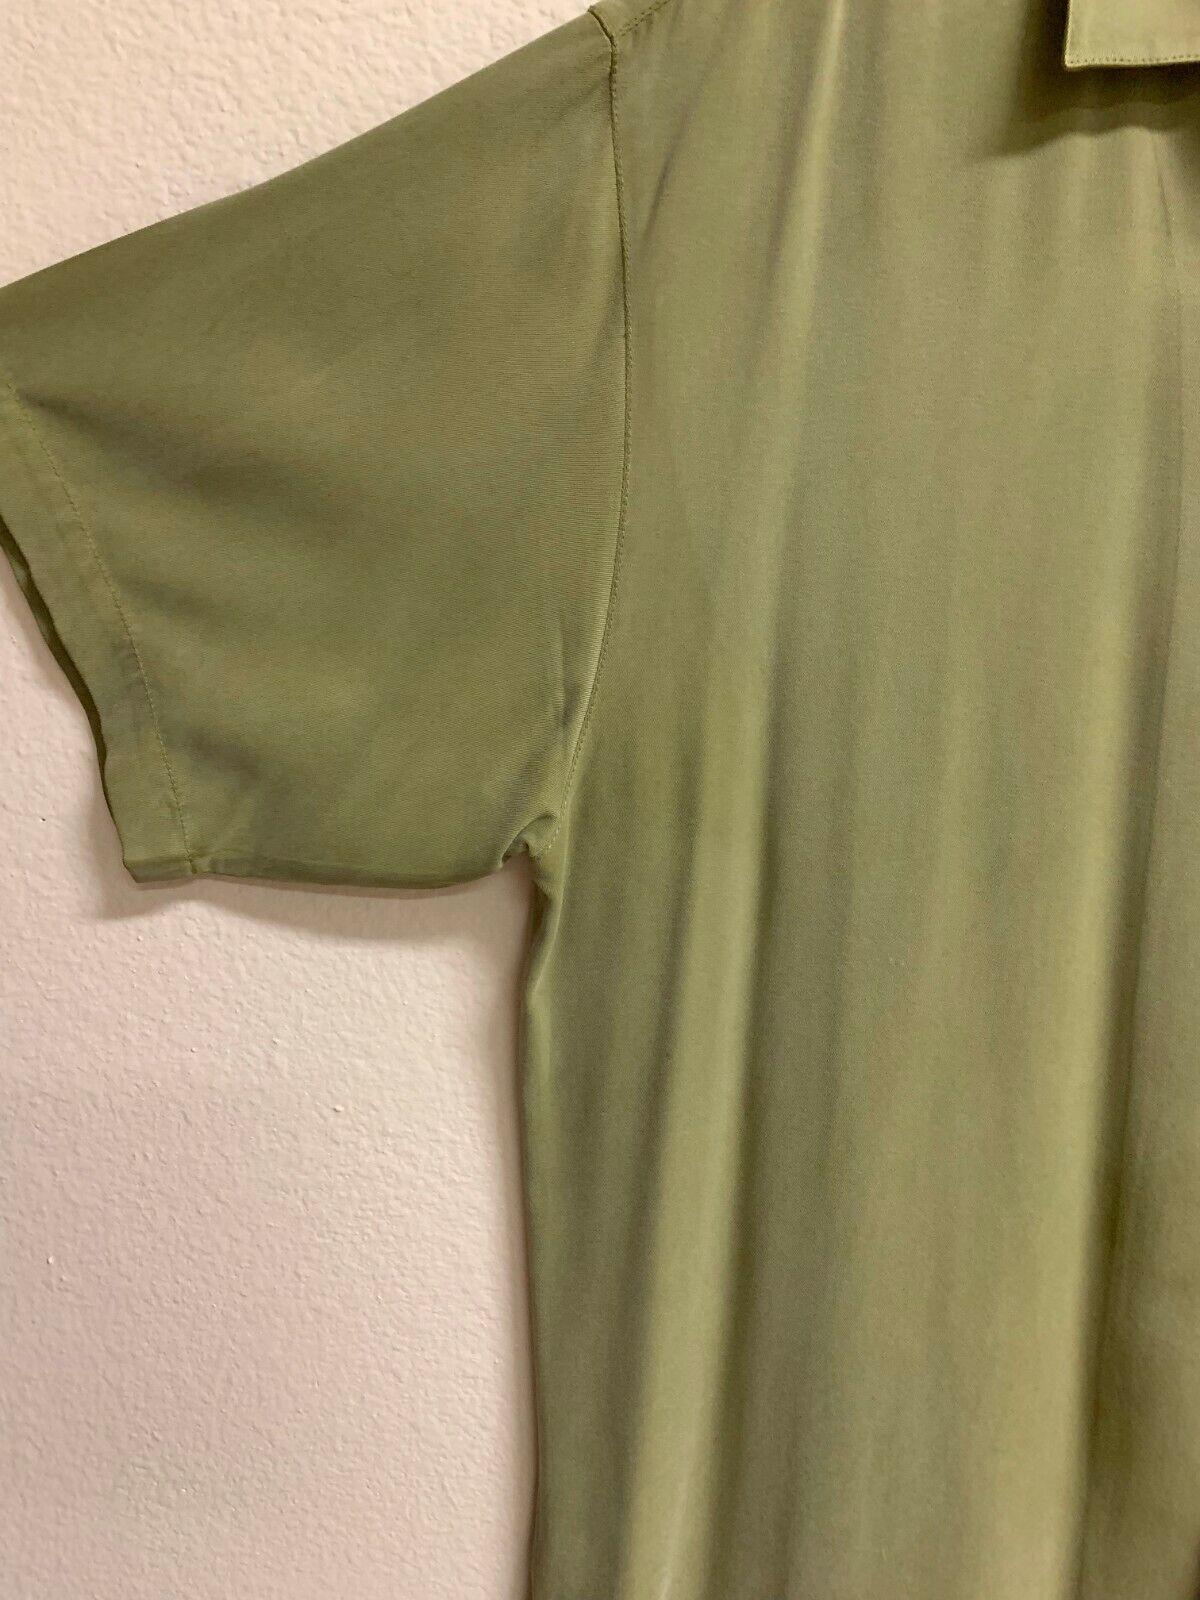 Green Tommy Bahama 100% Silk Shirt - image 3